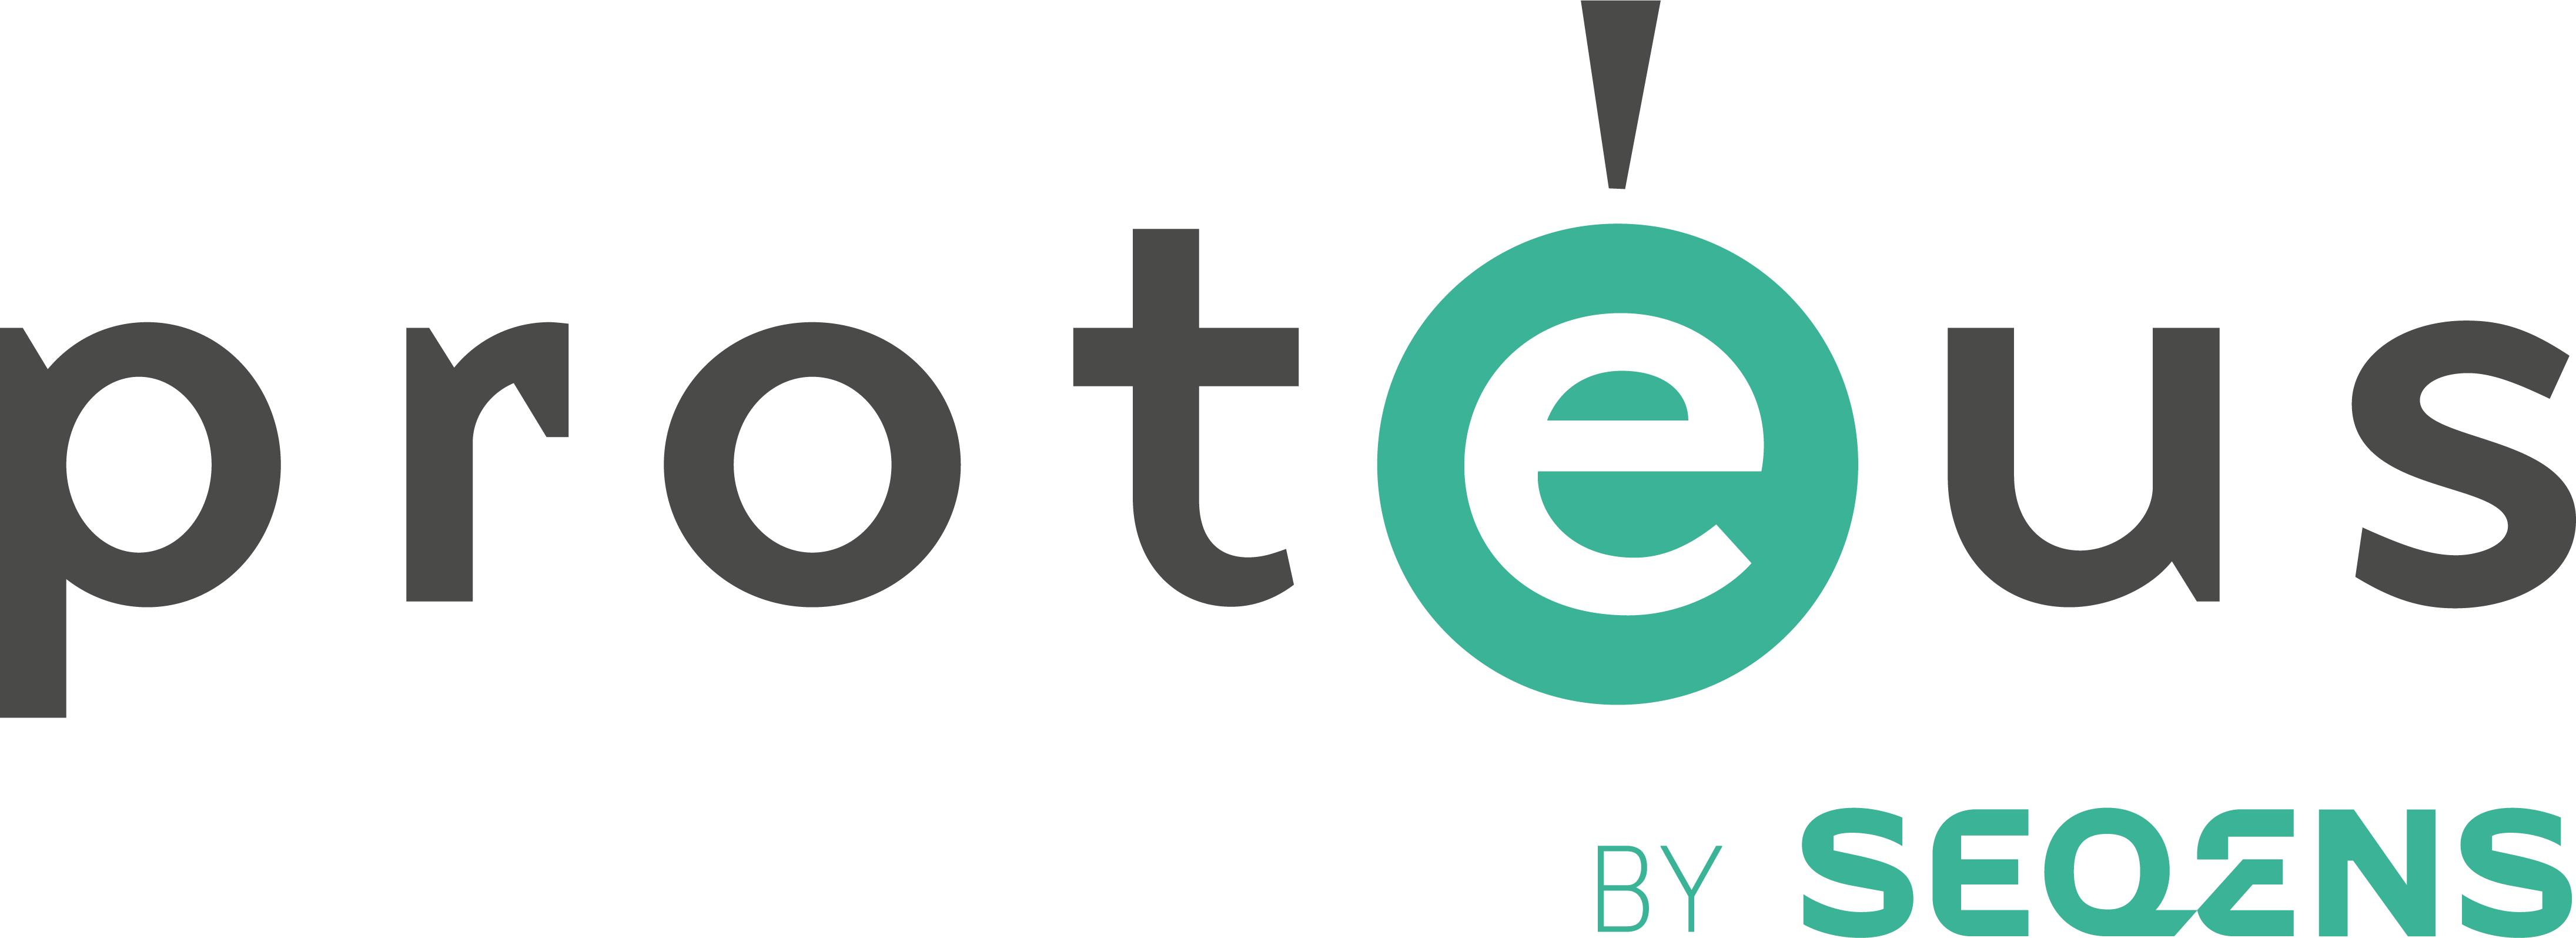 Seqens logo - sponsor